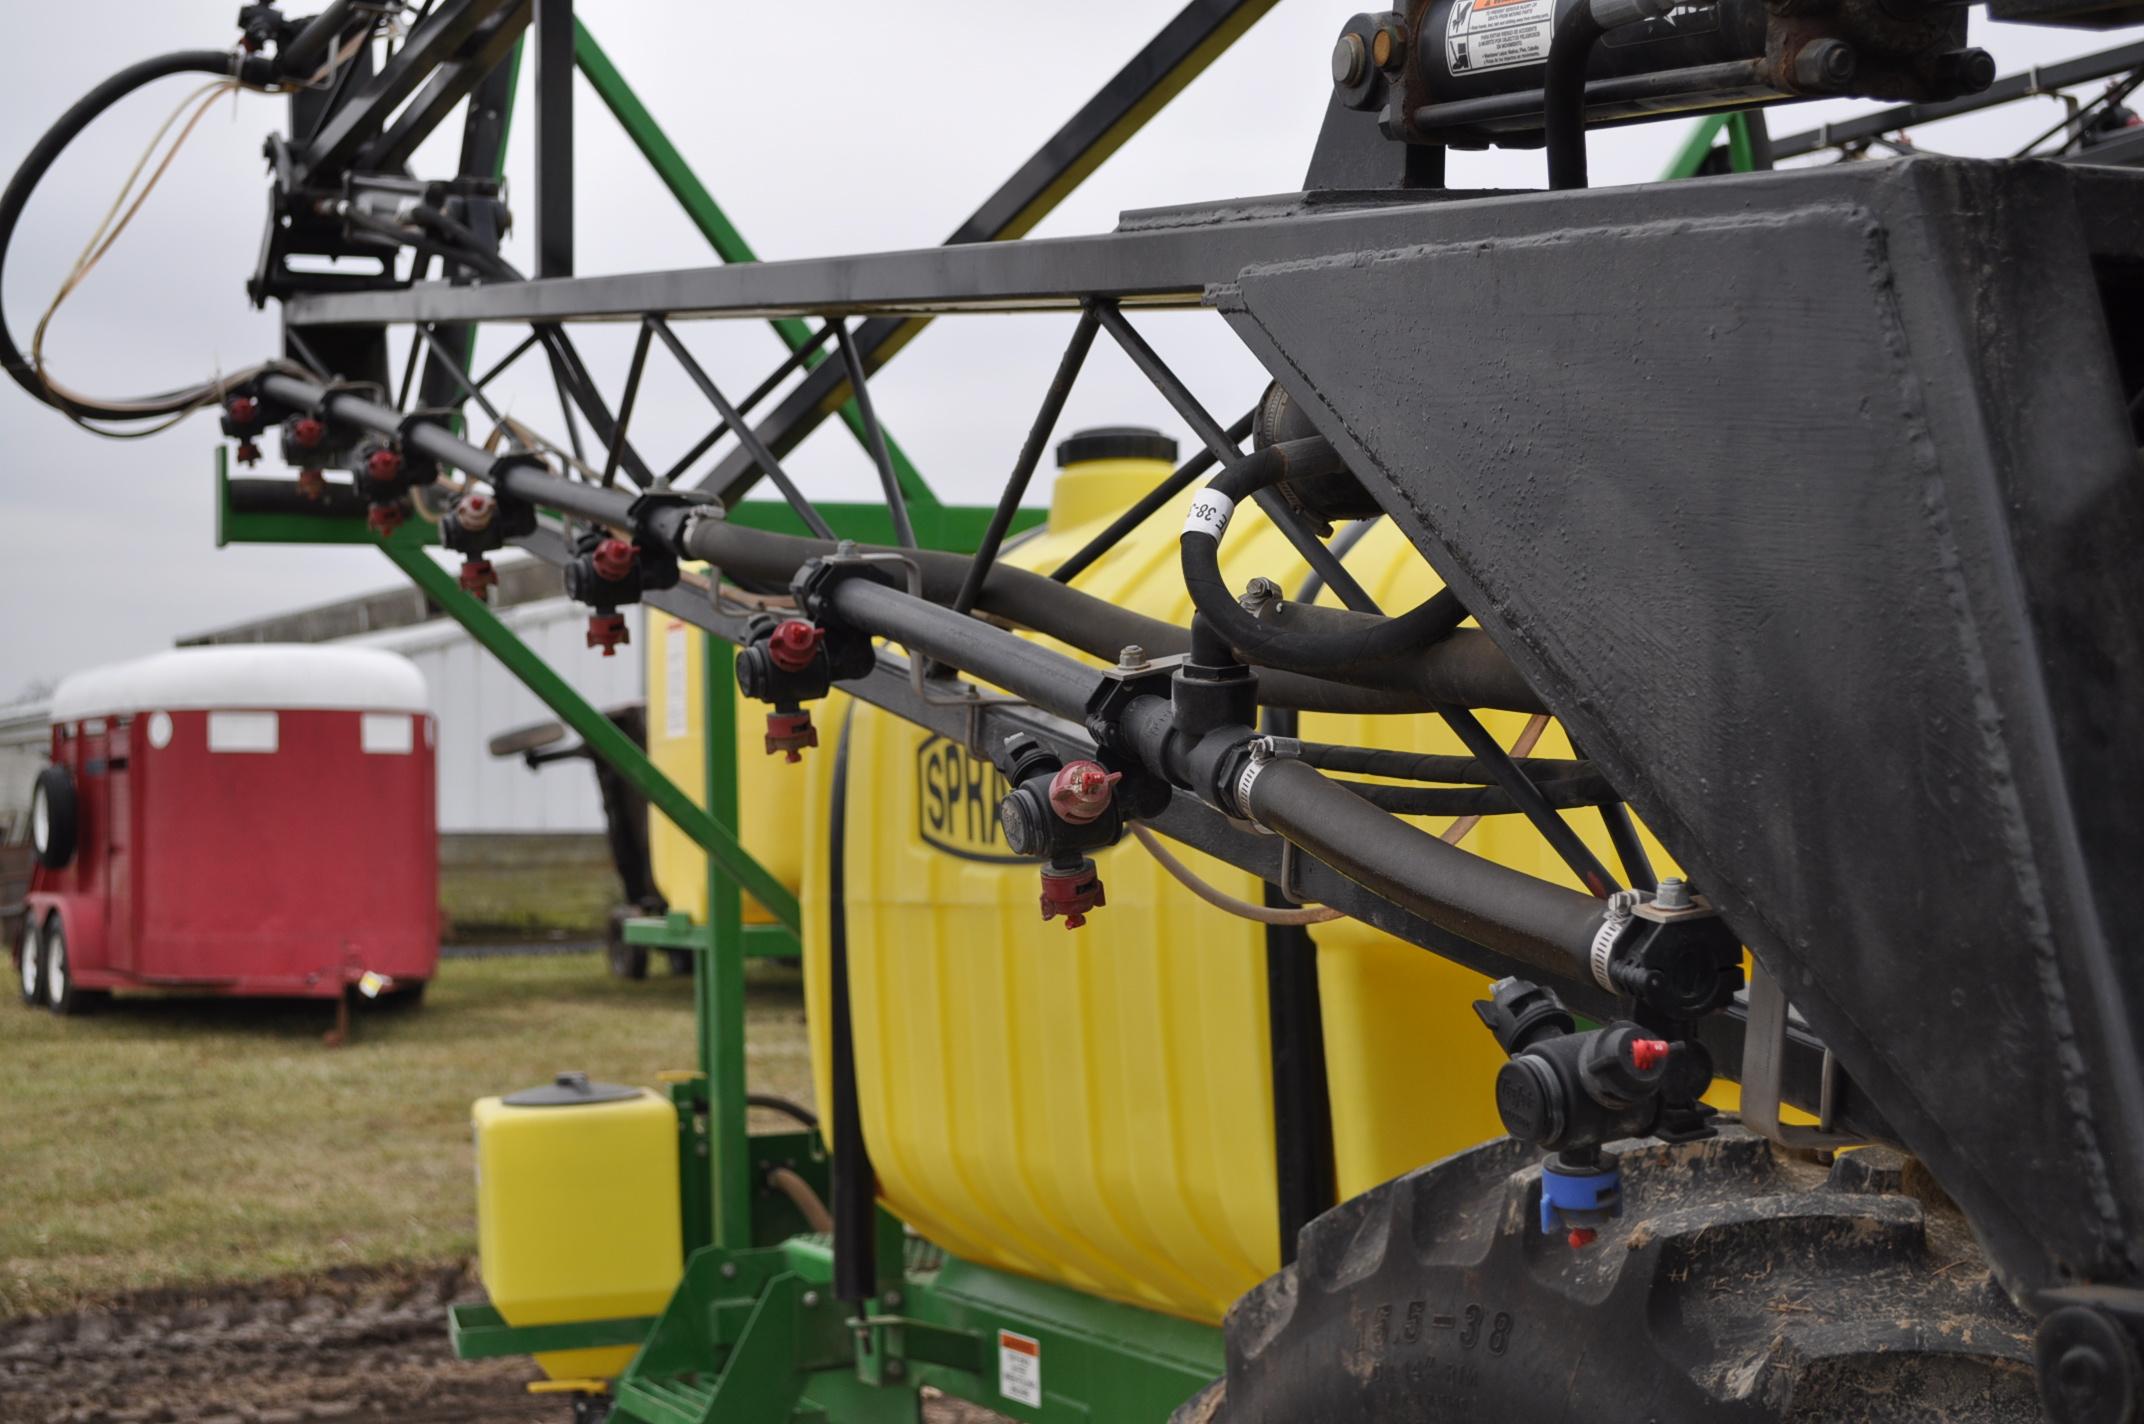 60' Spray King 1090 sprayer, 1000 gal poly tank, 100 gal rinse tank, foam marker, inductor, hyd - Image 13 of 21